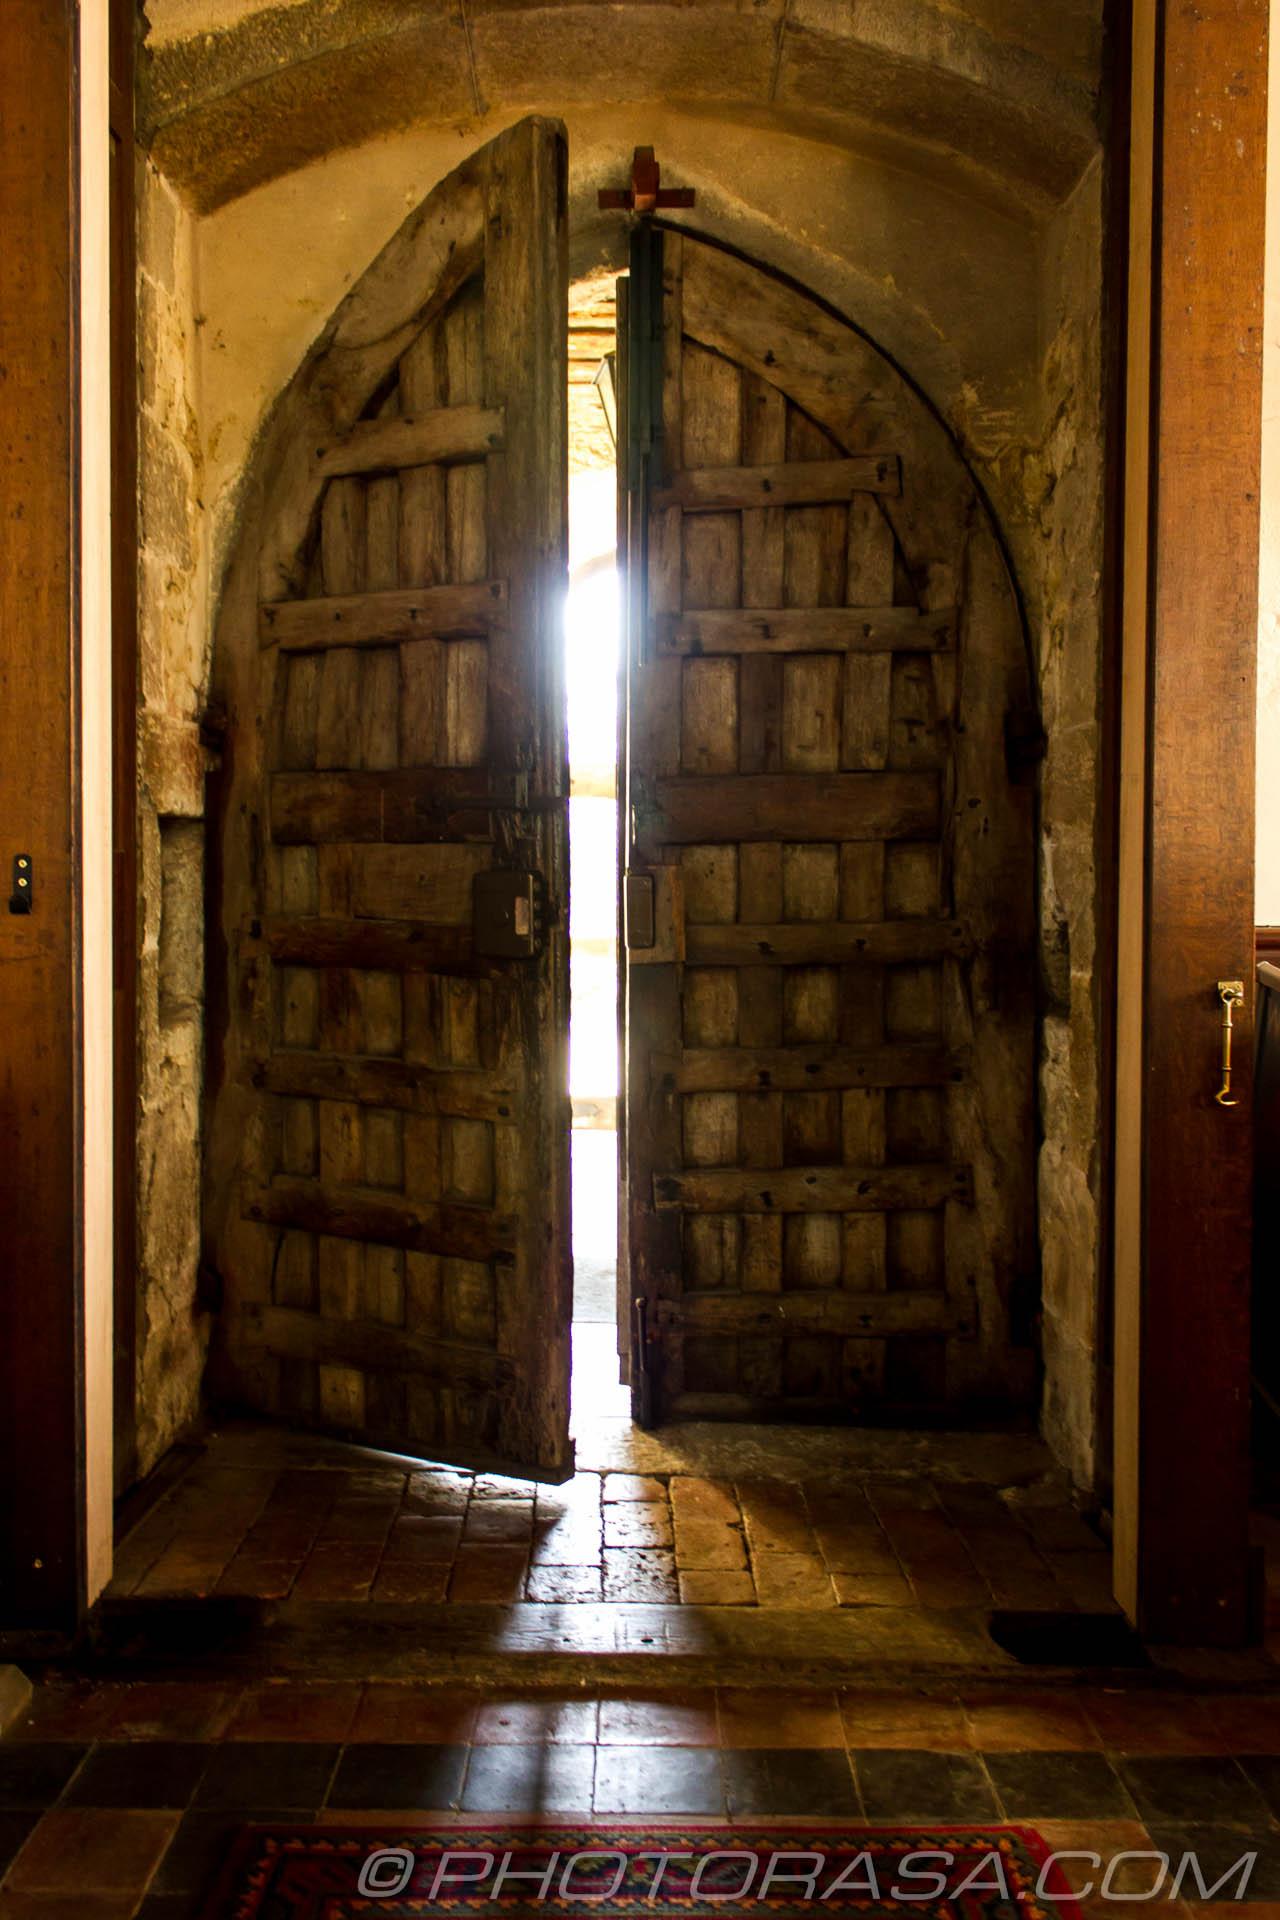 http://photorasa.com/parish-church-st-peter-st-paul-headcorn/old-church-front-door-ajar/